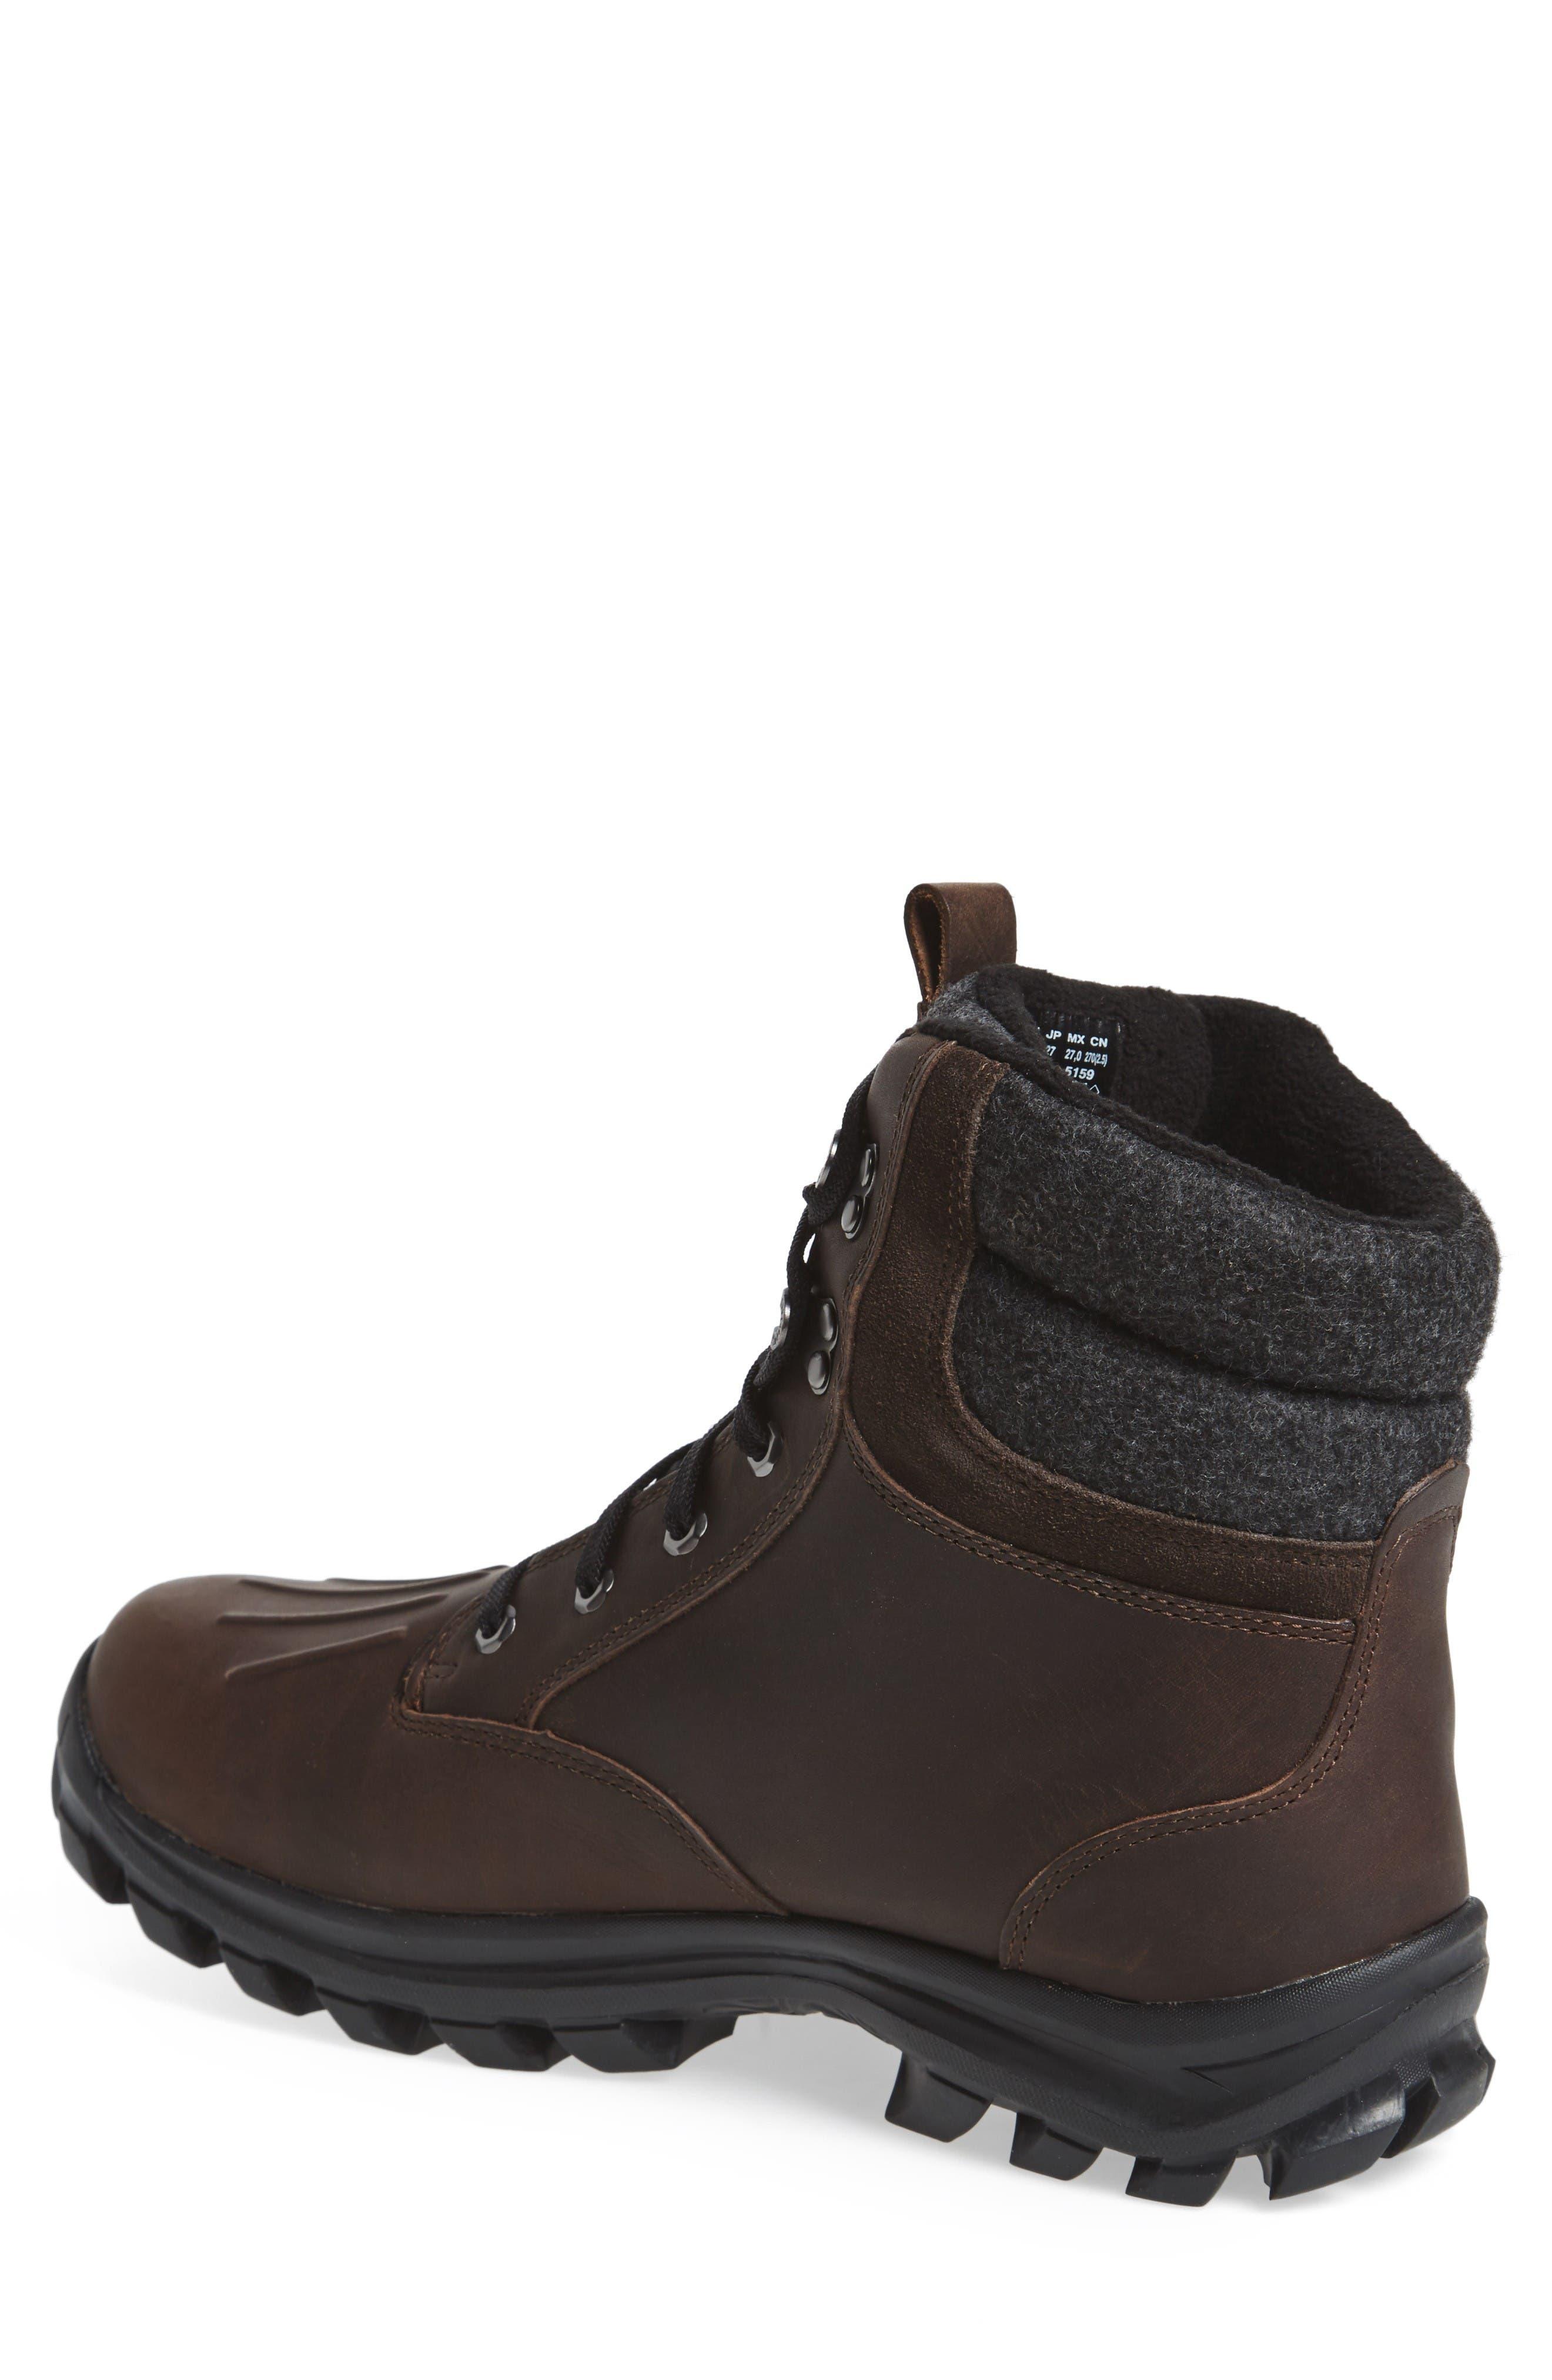 Alternate Image 2  - Timberland Chillberg Mid Waterproof Snow Boot (Men)